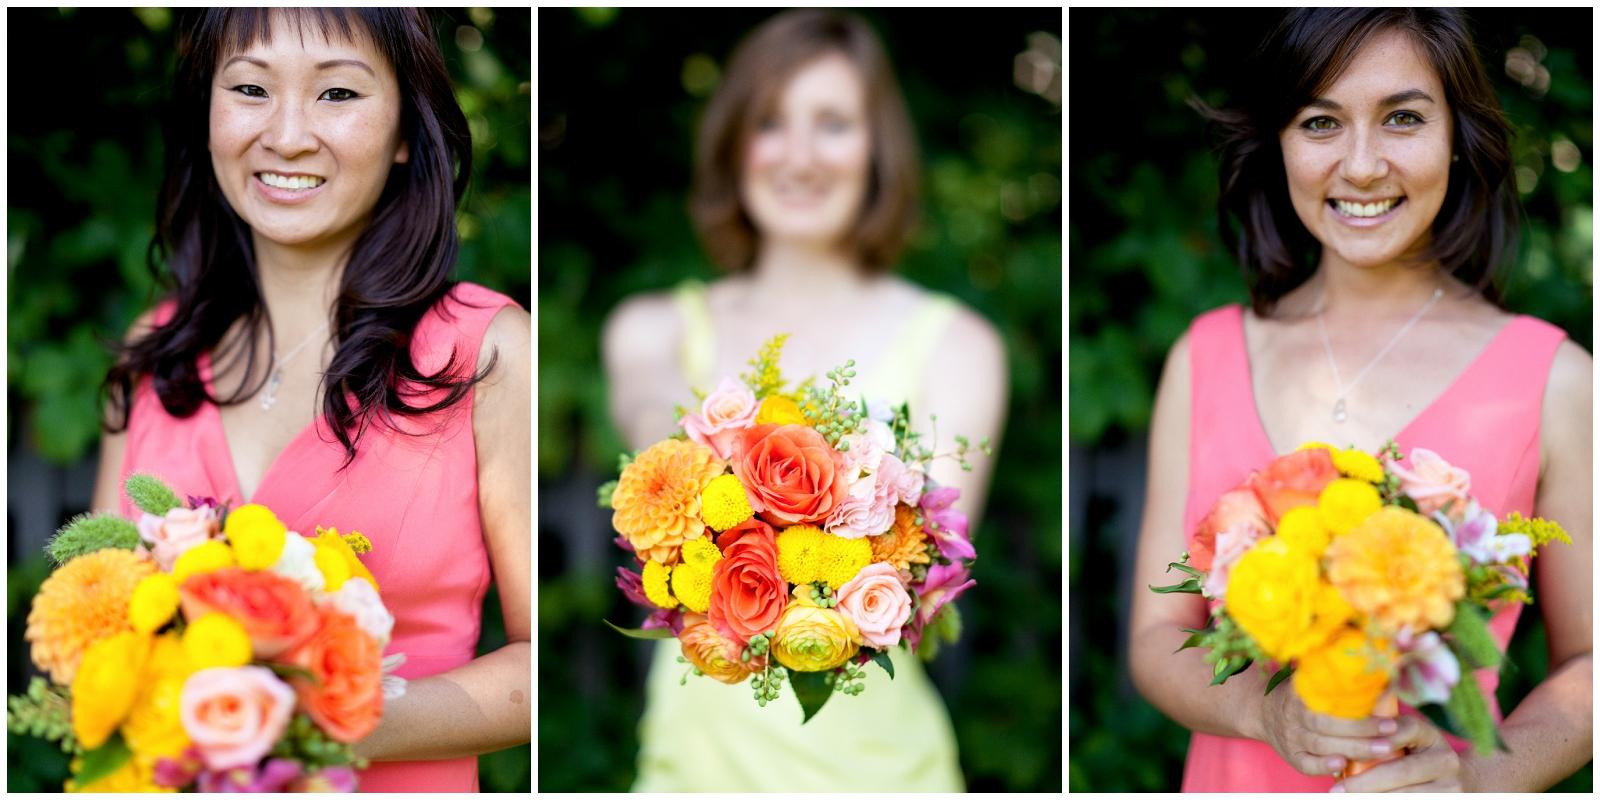 San-Francisco-Bay-Area-Wedding-Photography-Brazilian-Room-8.jpg